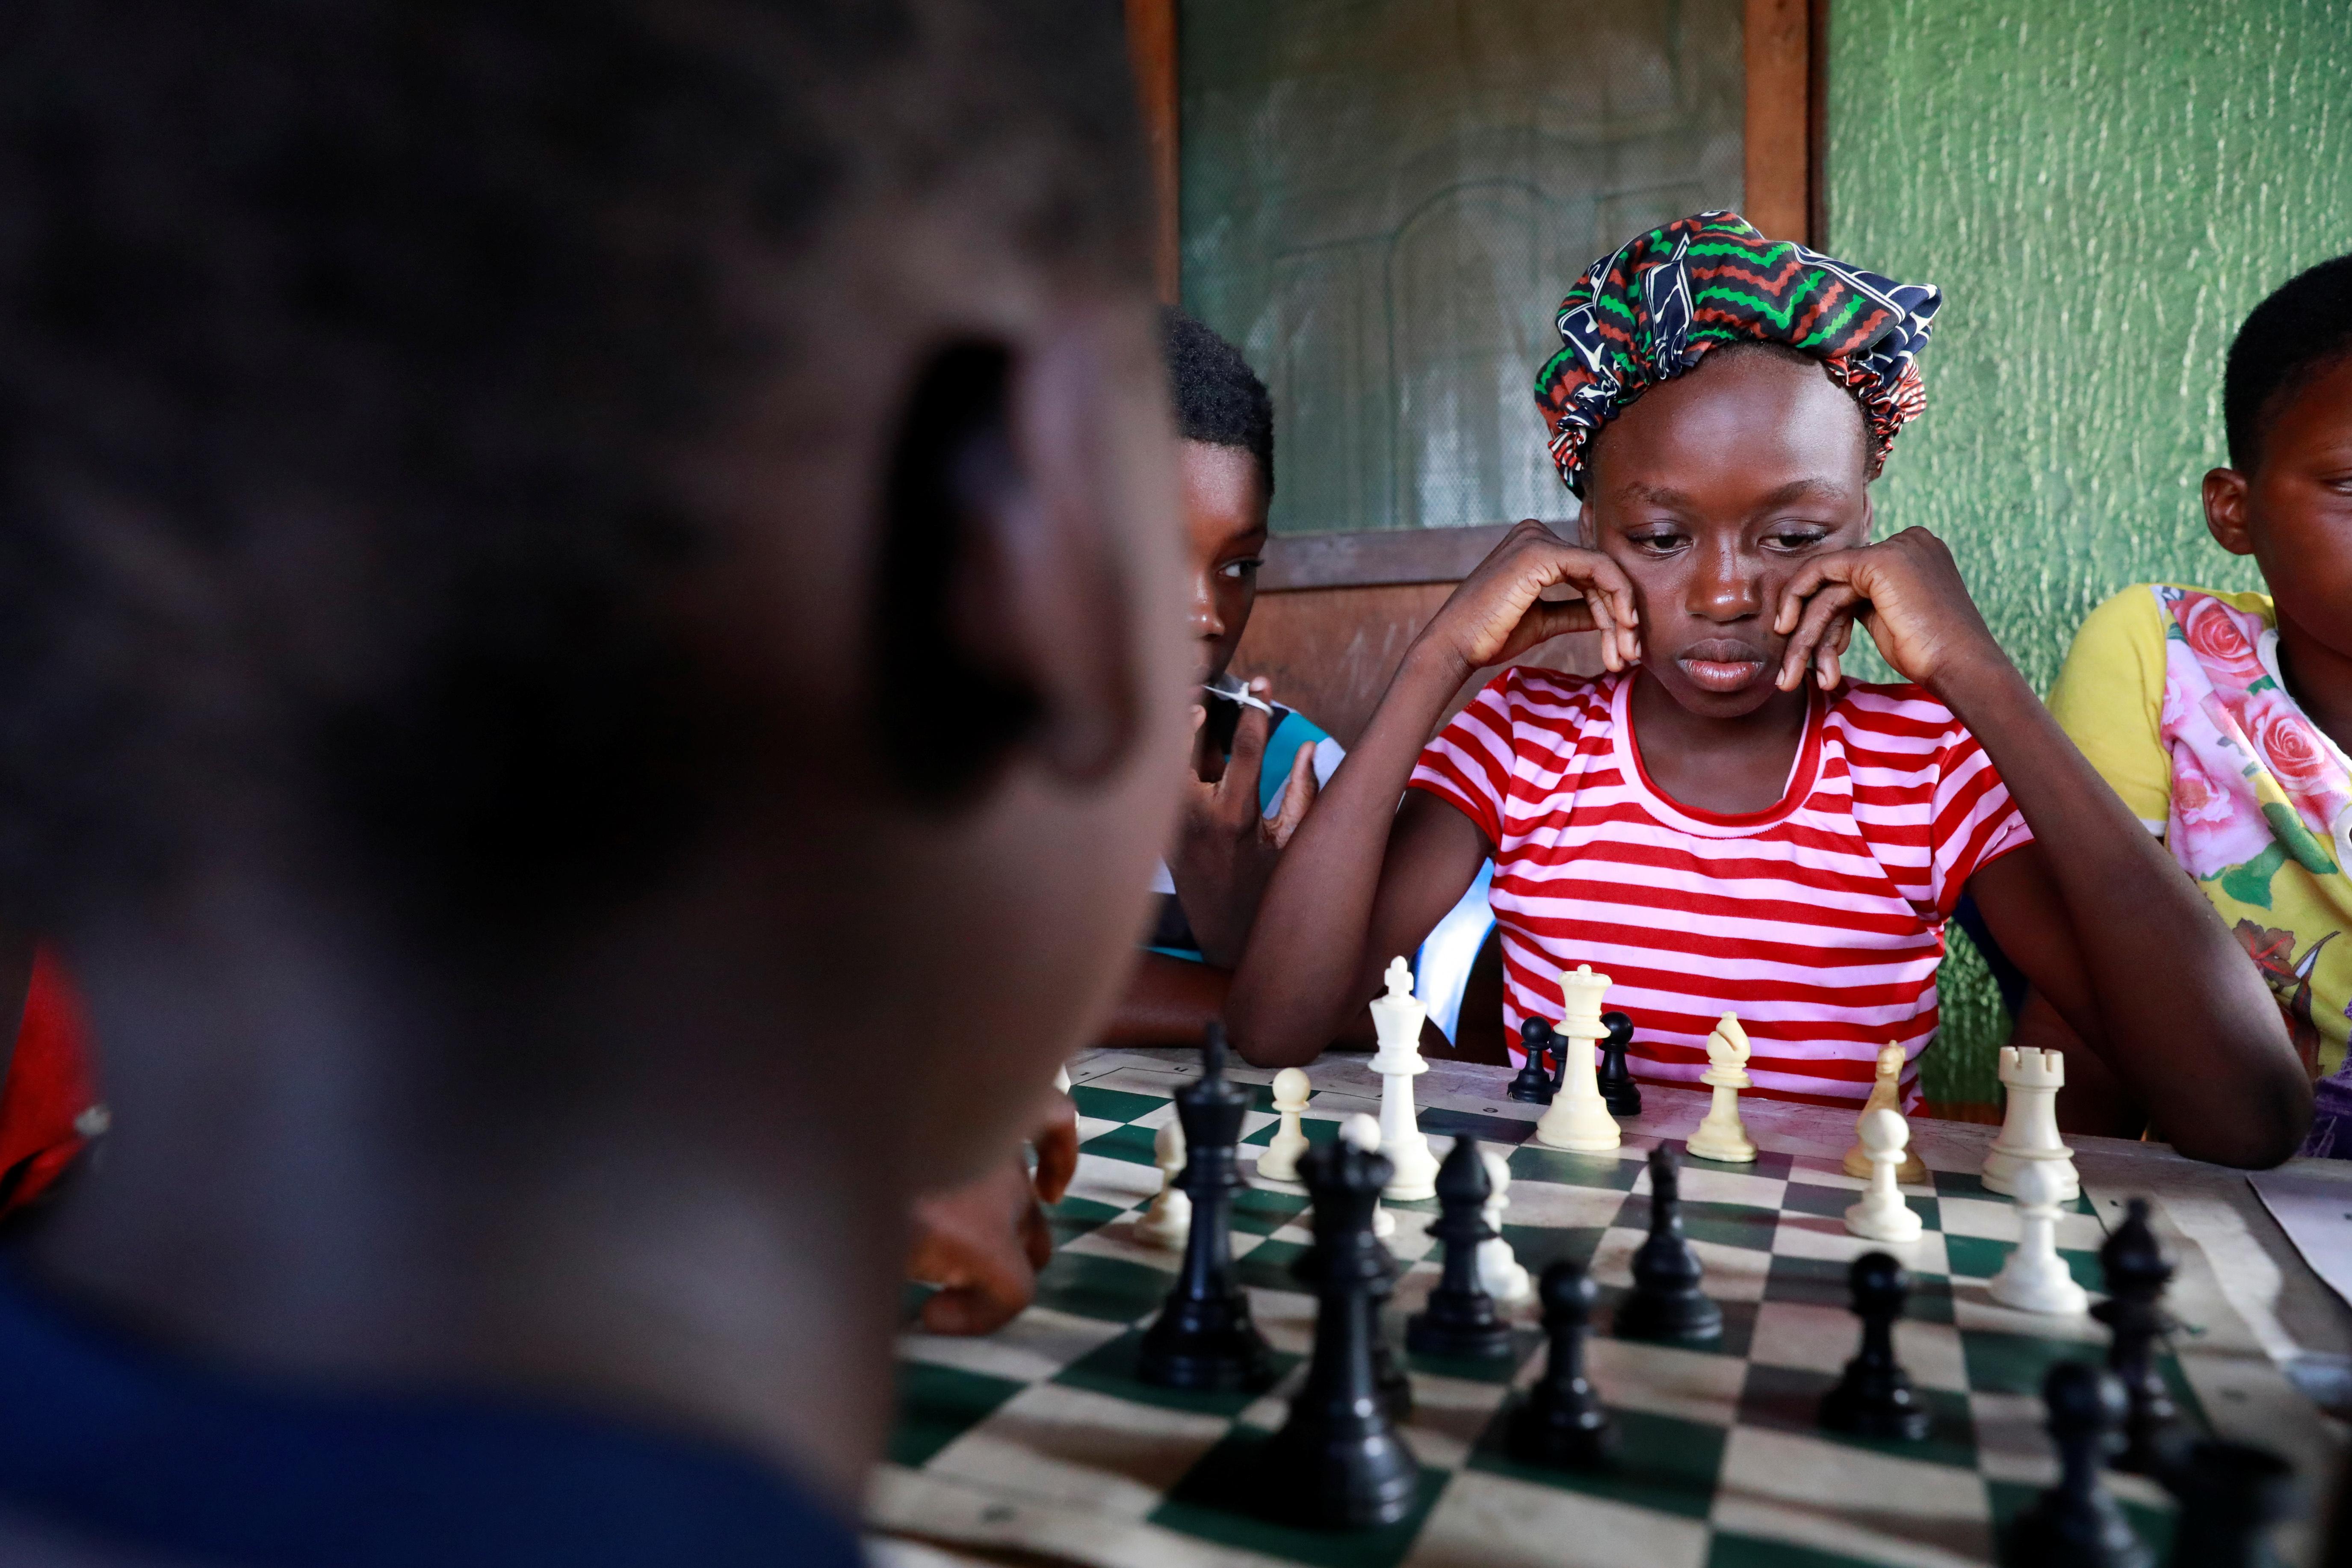 Children play chess at a community palace in Makoko, Lagos, Nigeria May 5, 2021. REUTERS/Temilade Adelaja